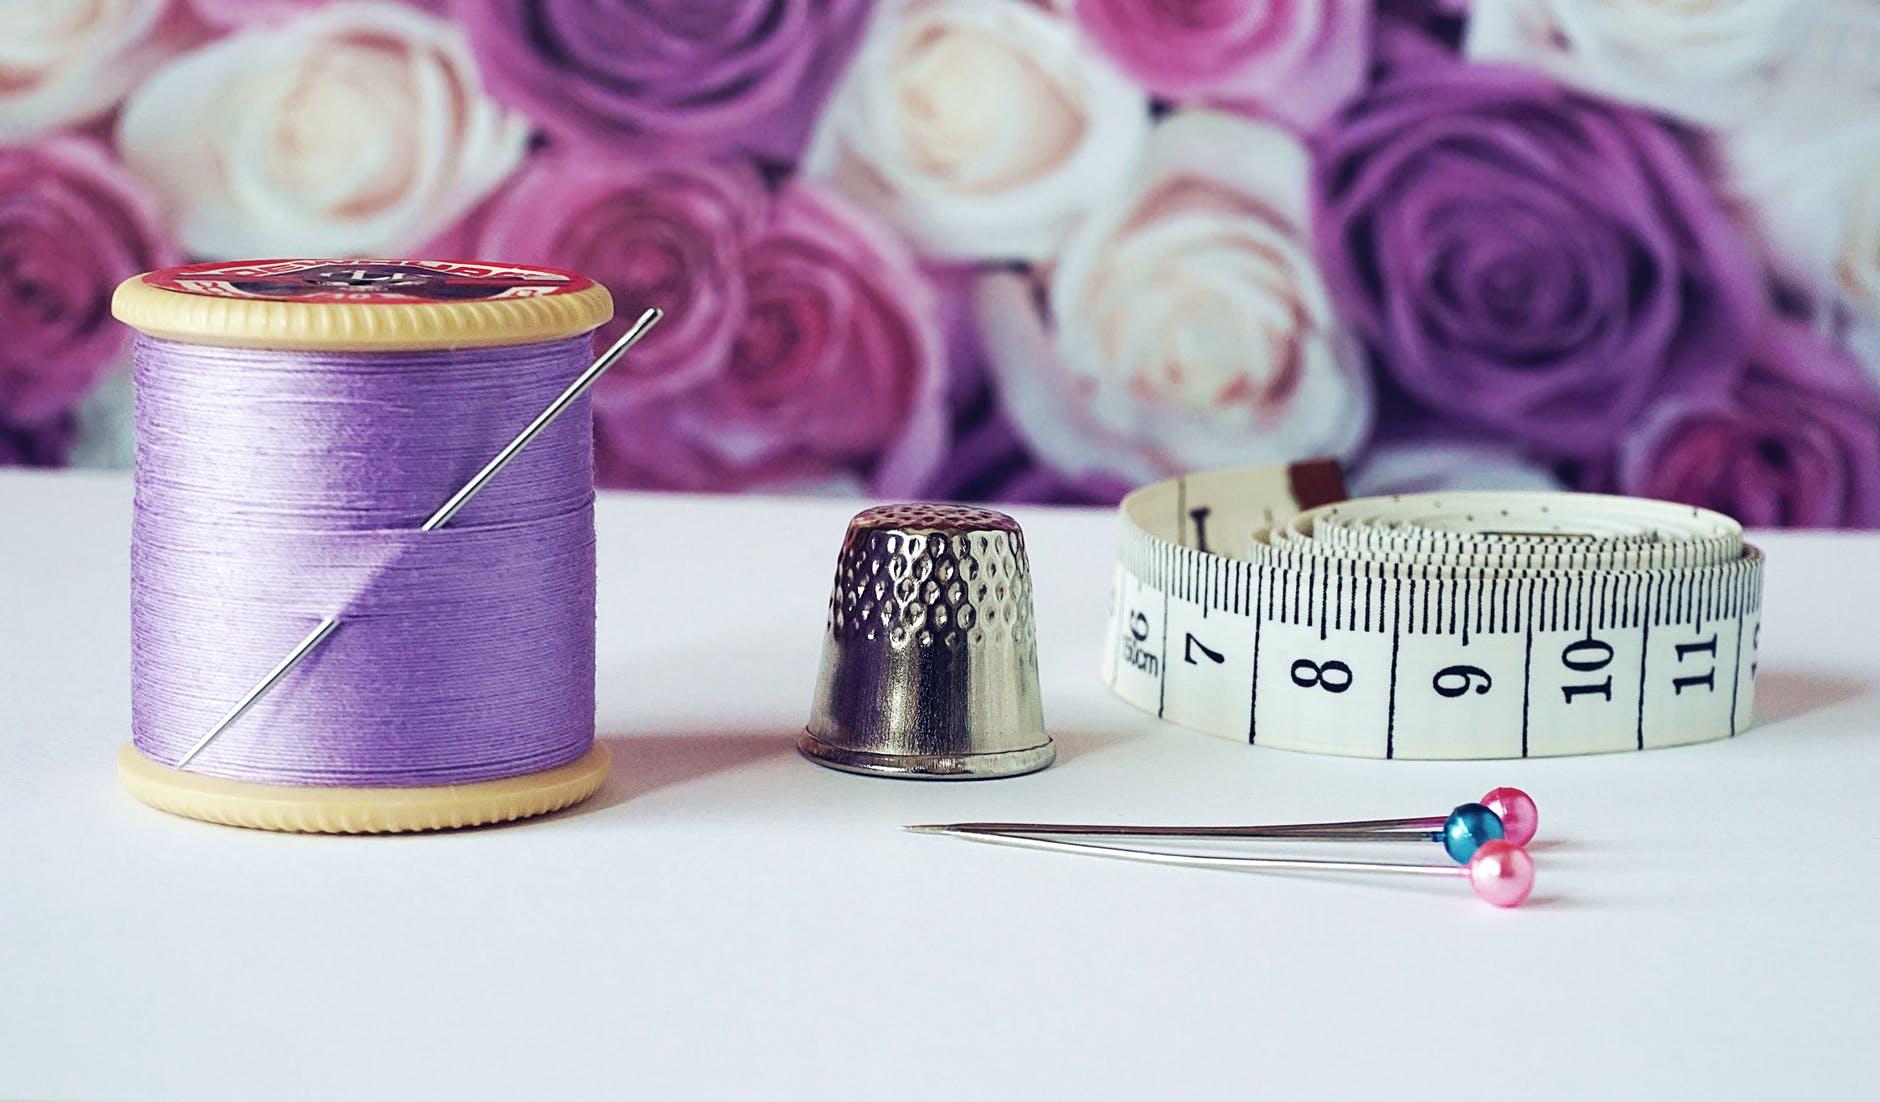 spool of purple thread near needle thimble and measuring tape